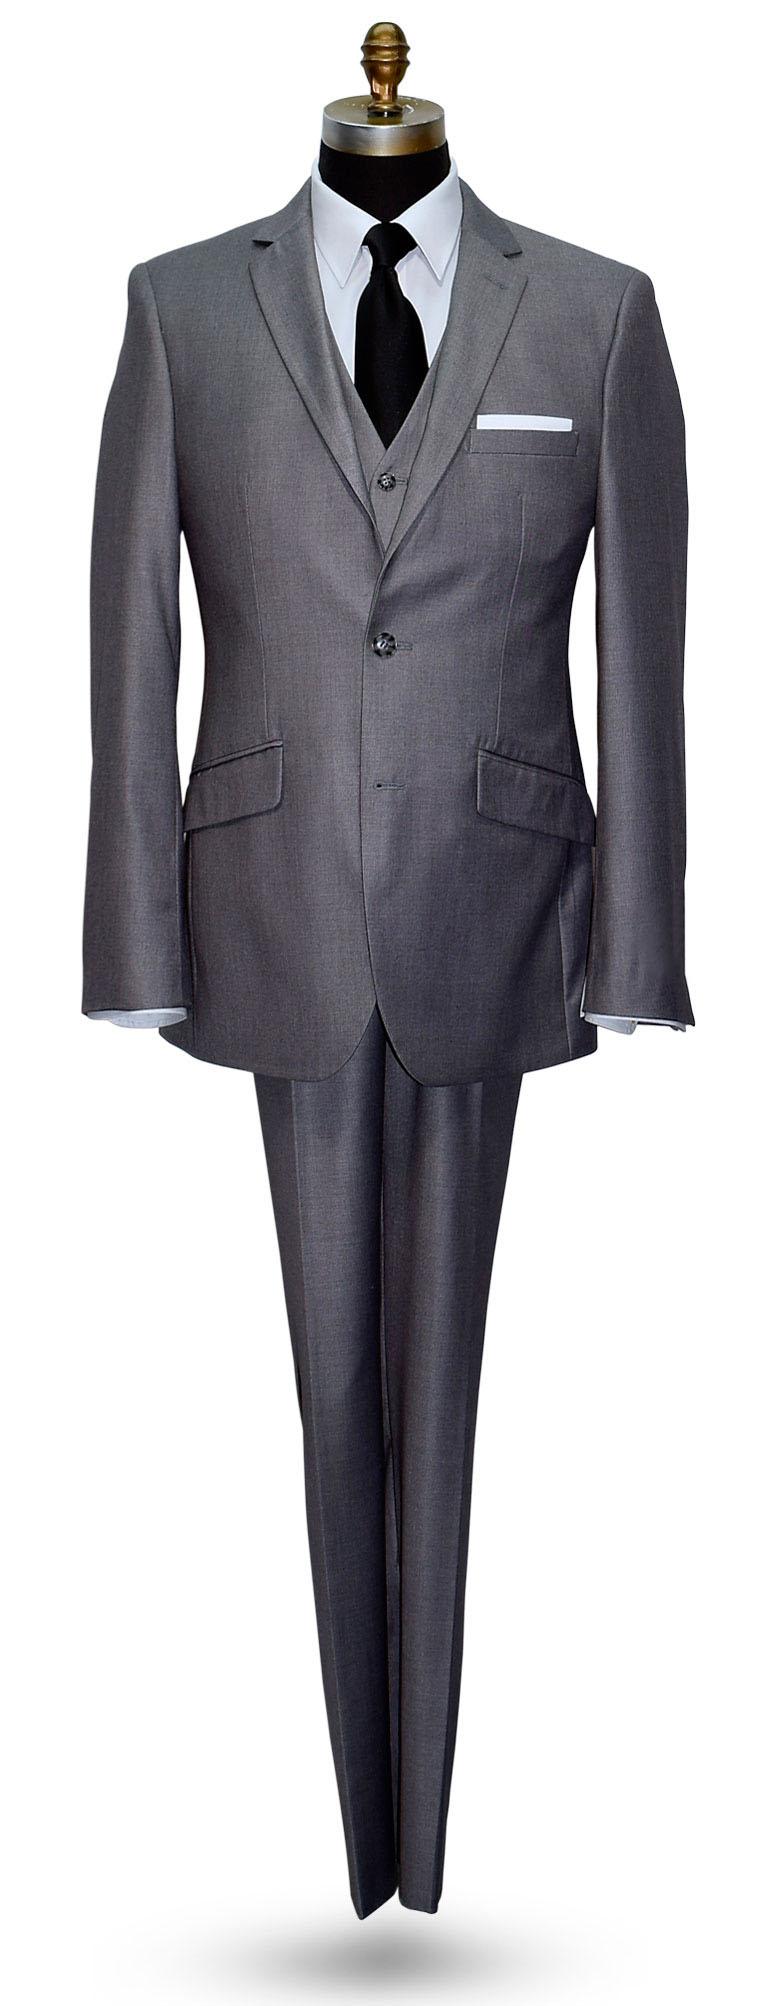 Spanish Medium Gray Mens 2 Piece Slim Fit Suit-Vest Optional